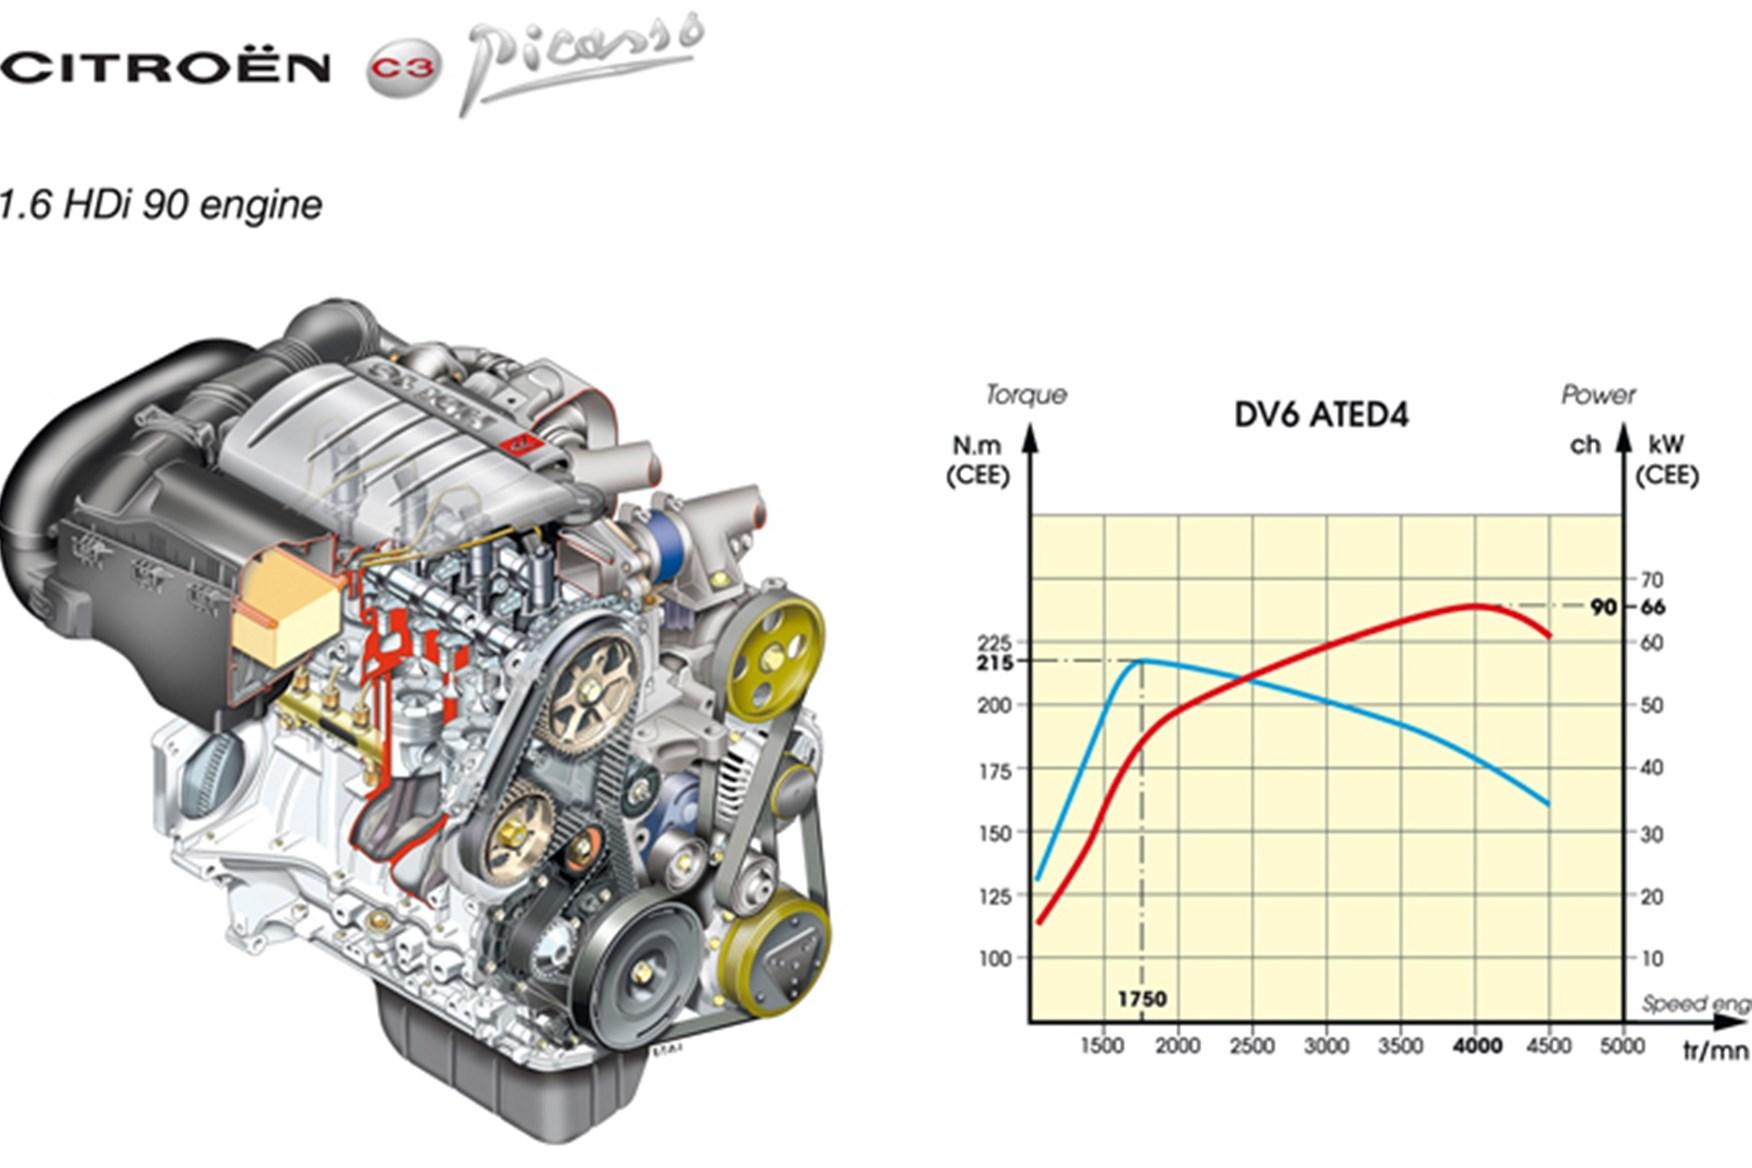 Citroen Berlingo Ii Multispace 2008 Engine Diagram Tsb Wiring Diagrams C3 Bsi Says Itll Be The Best Seller In Picasso Range